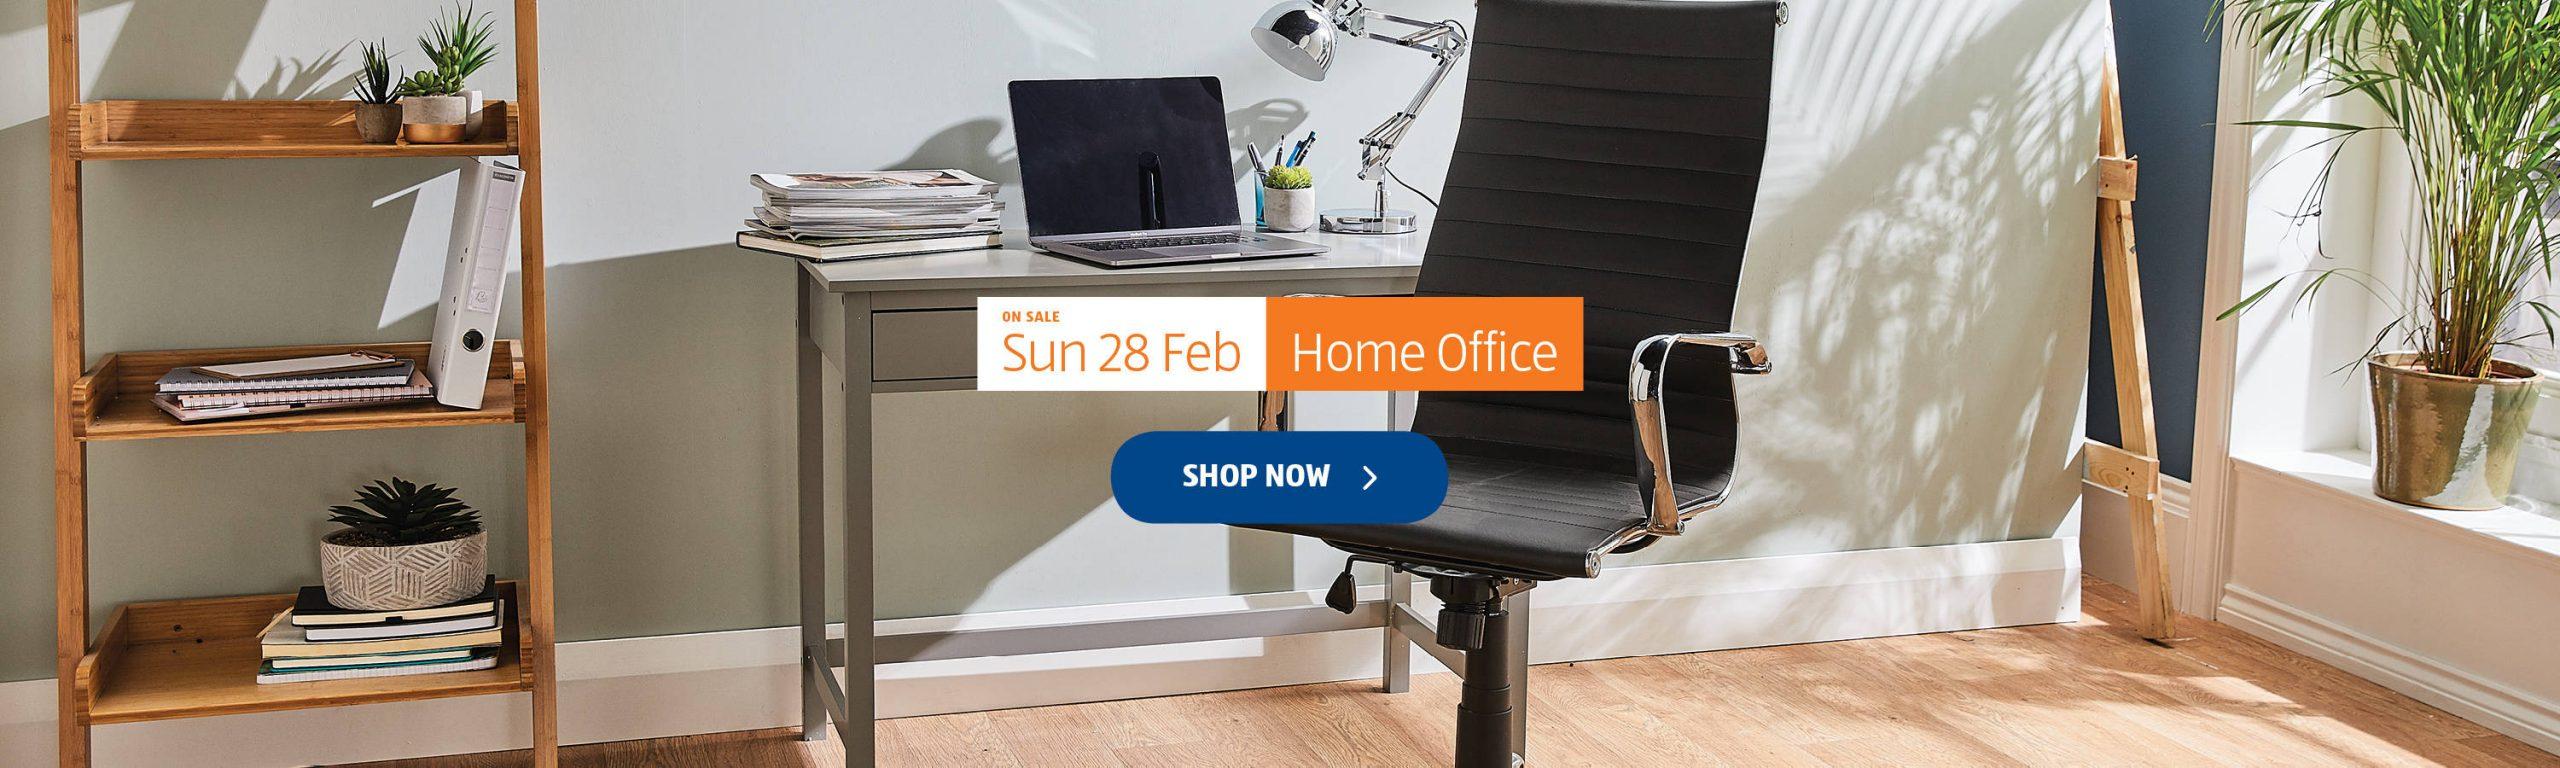 ALDI Sunday Offers 28th February 2021 ALDI Home Office